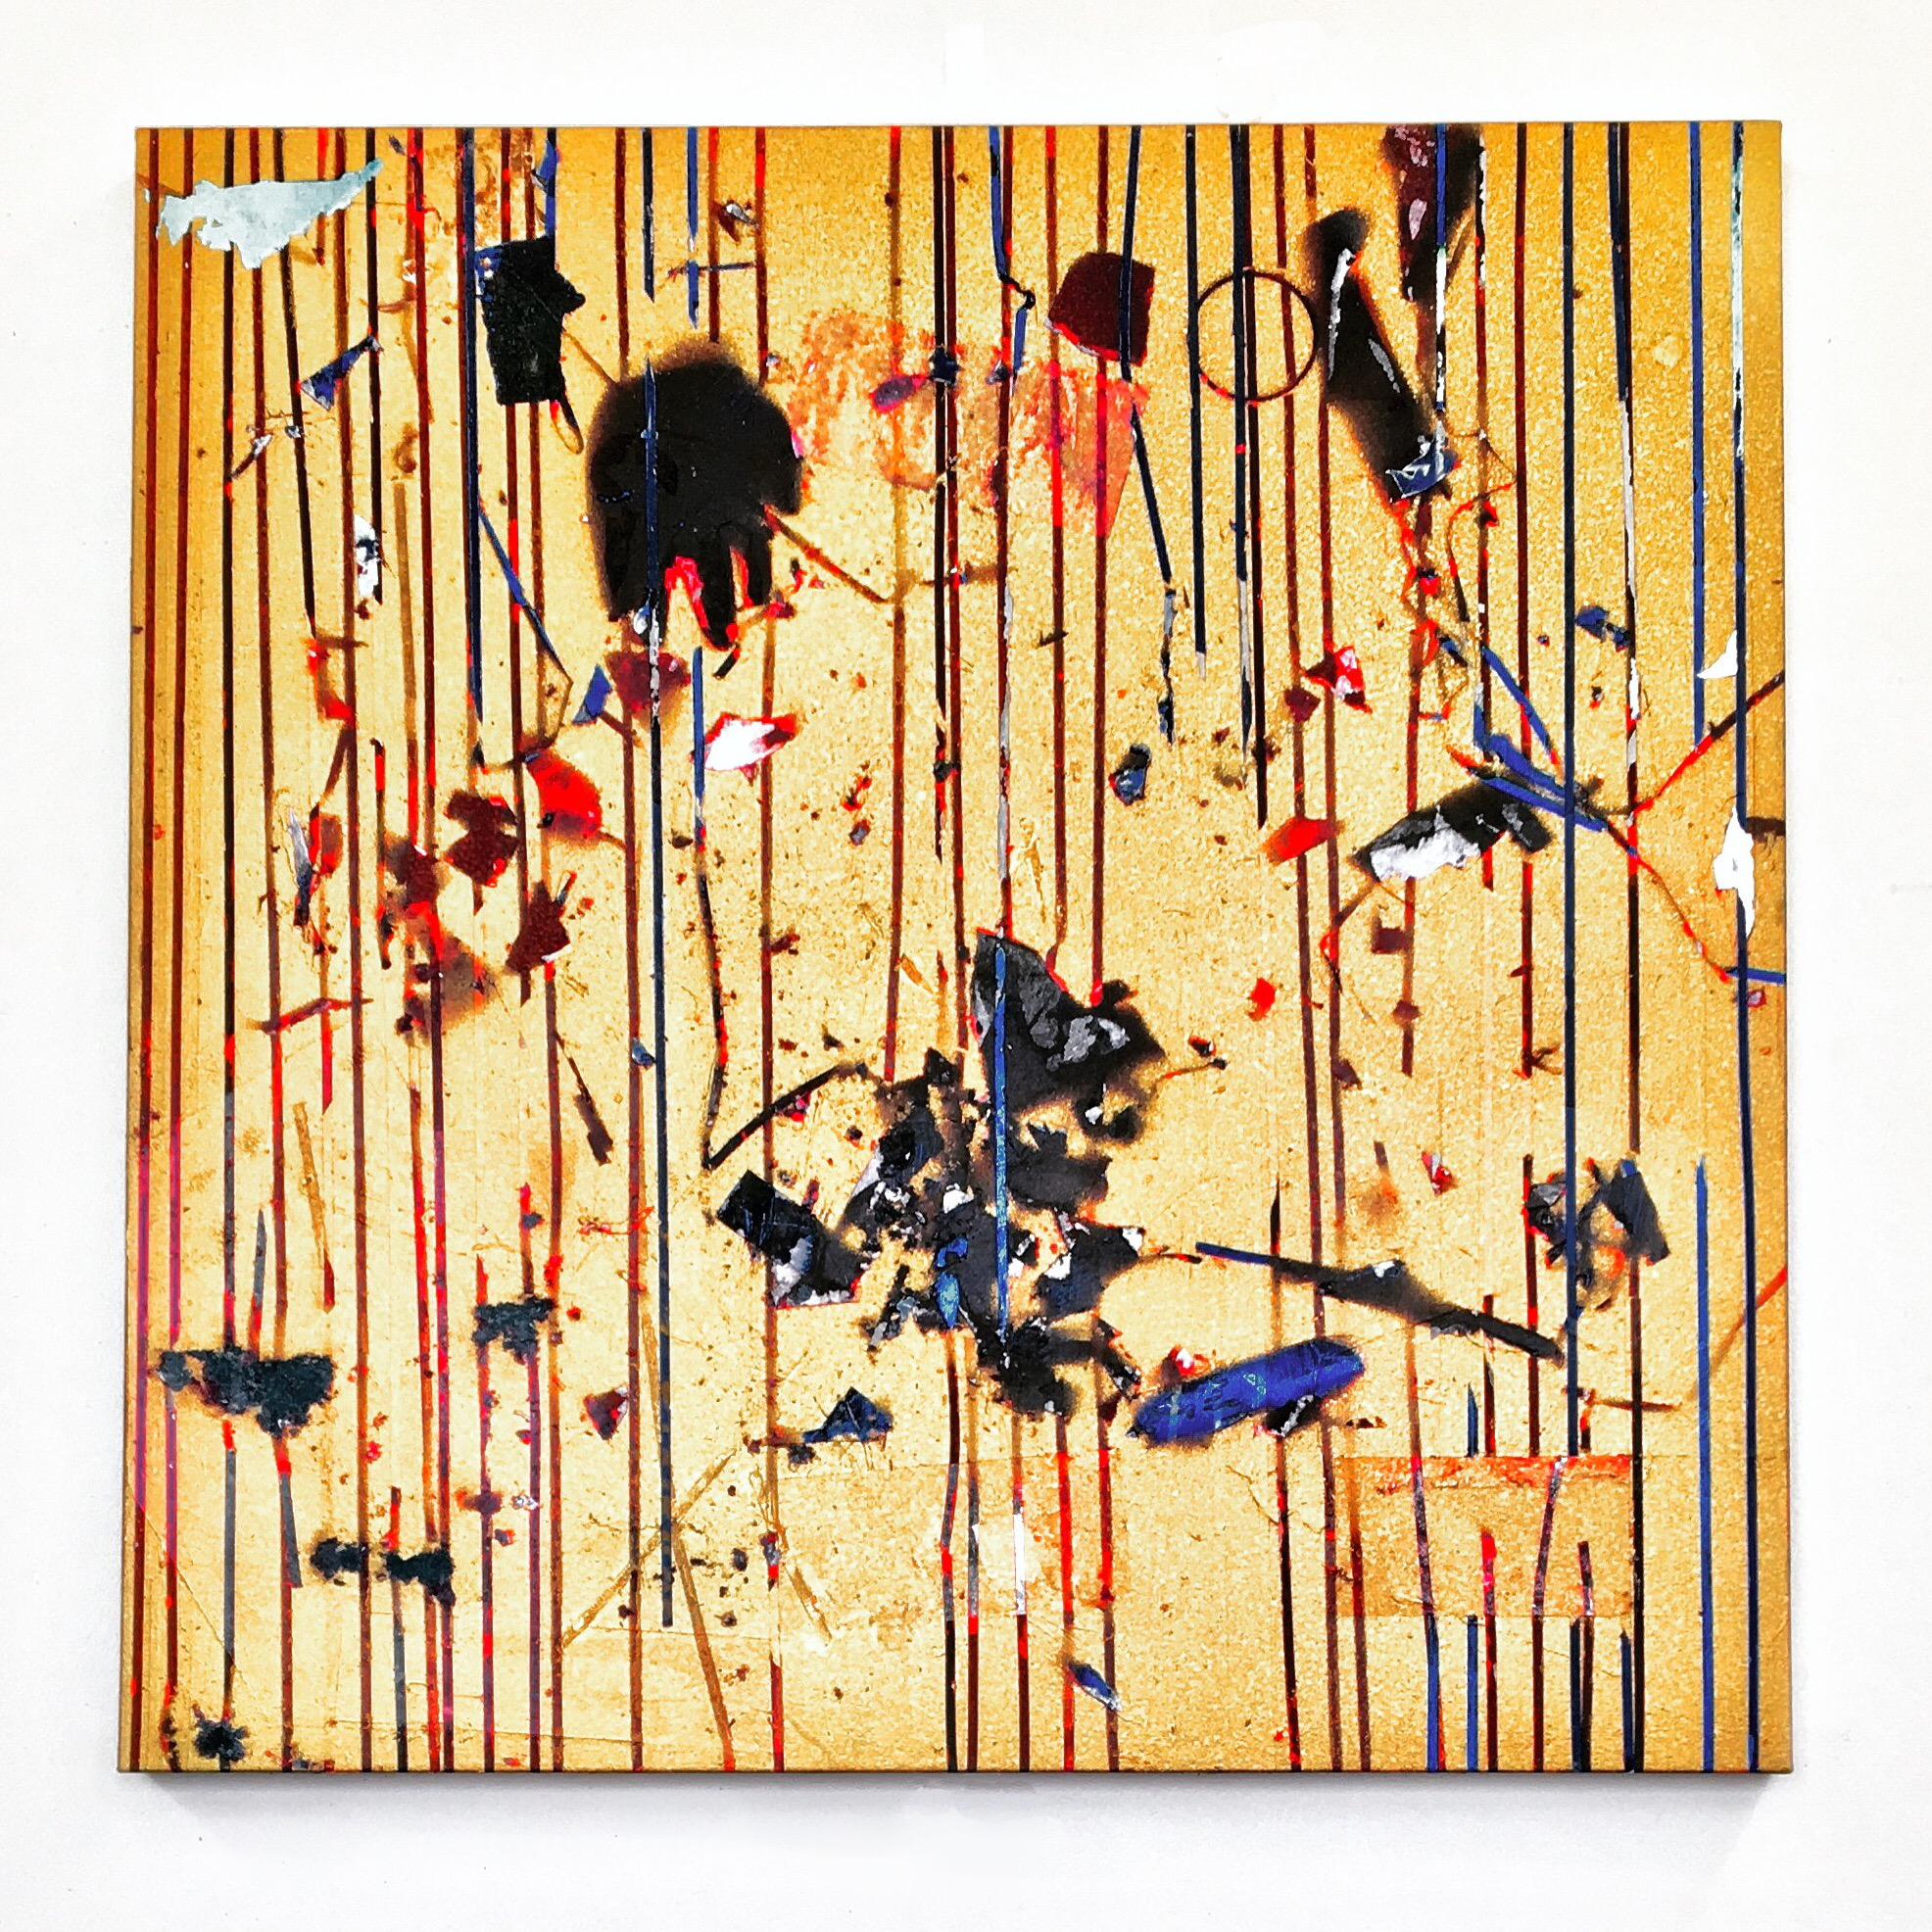 IAIN MUIRHEAD   1701  , 2014-2017. Oil, airborne pigment, acrylic binder, 10oz cotton duck canvas, white titanium gesso, milled pine, lauan plywood,3mm staples, 16 gauge pneumatic nails. 41 x 41 inches.